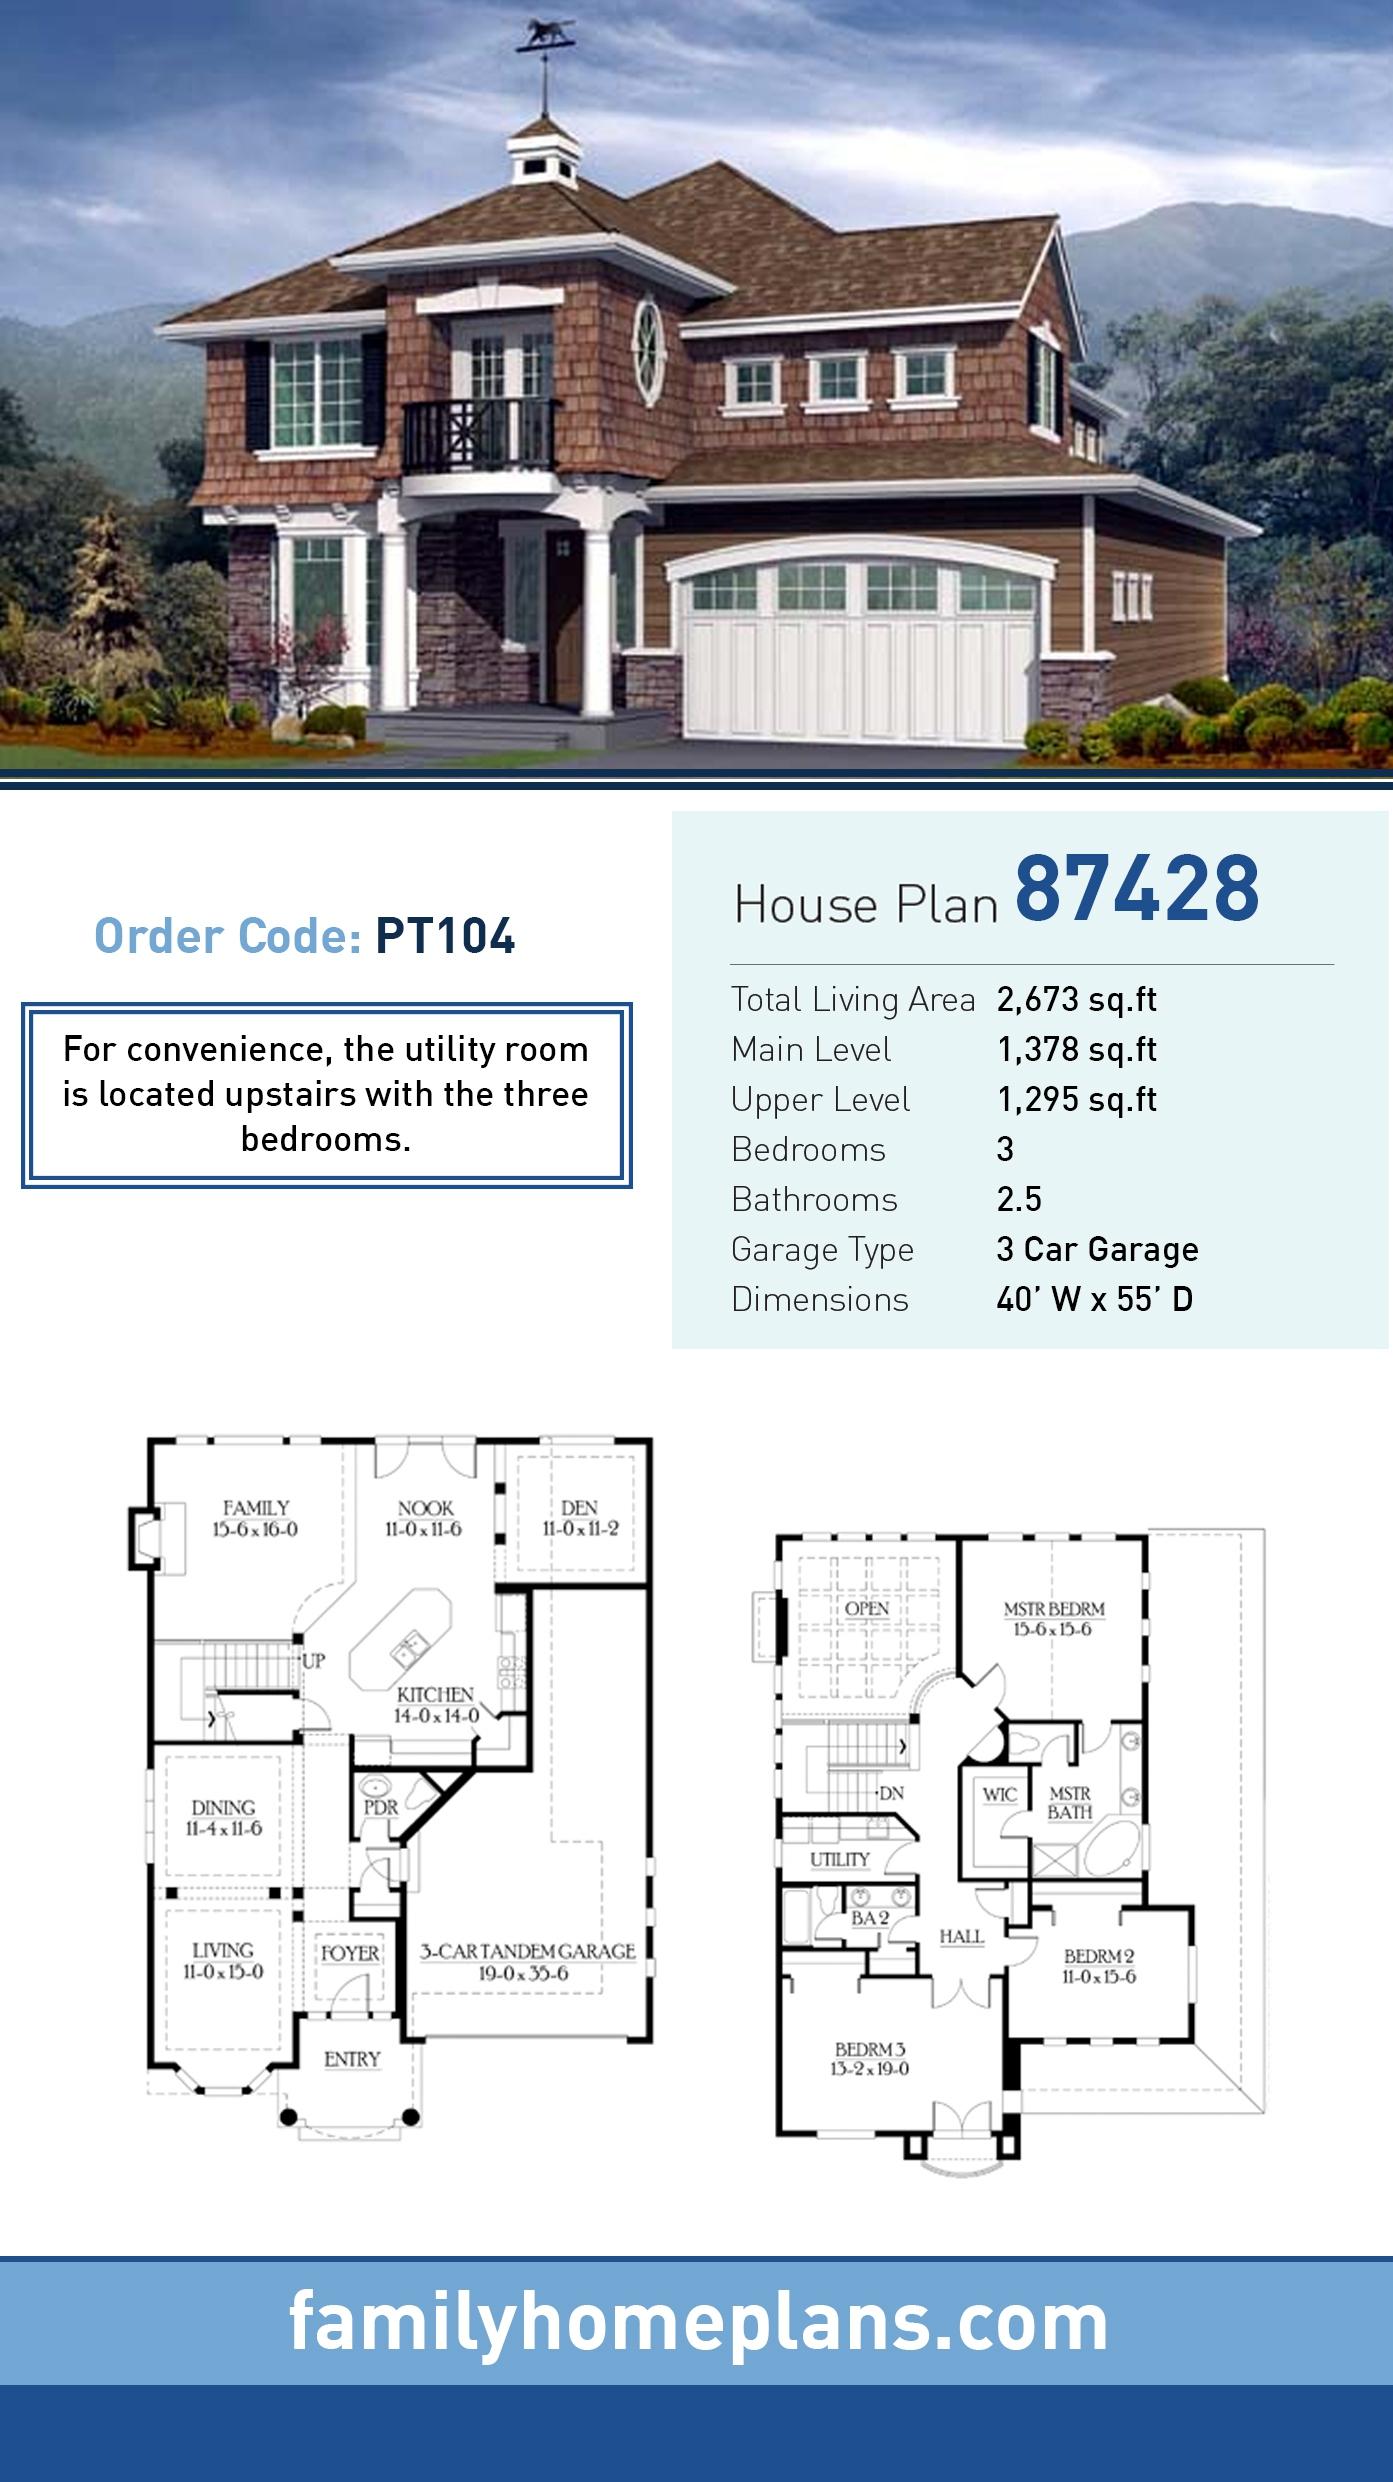 Craftsman House Plan 87428 with 3 Beds, 3 Baths, 3 Car Garage